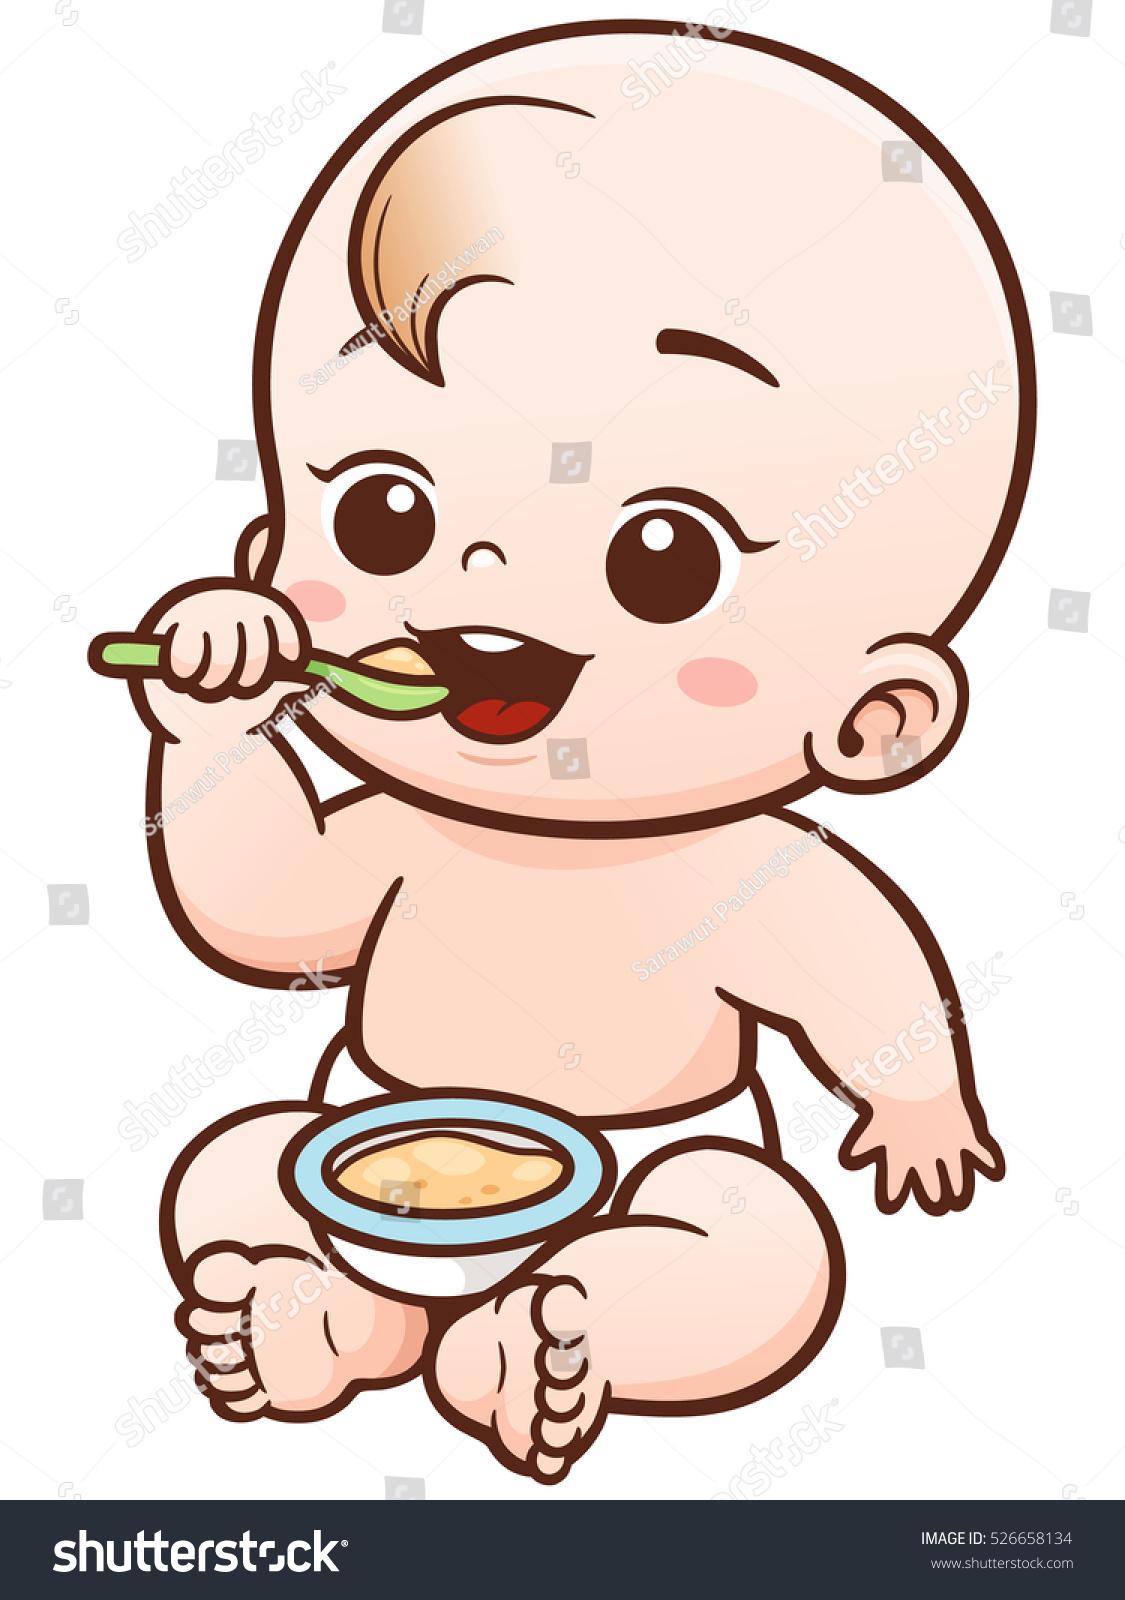 Vector Illustration Cartoon Cute Baby Eating Stock Vector ...